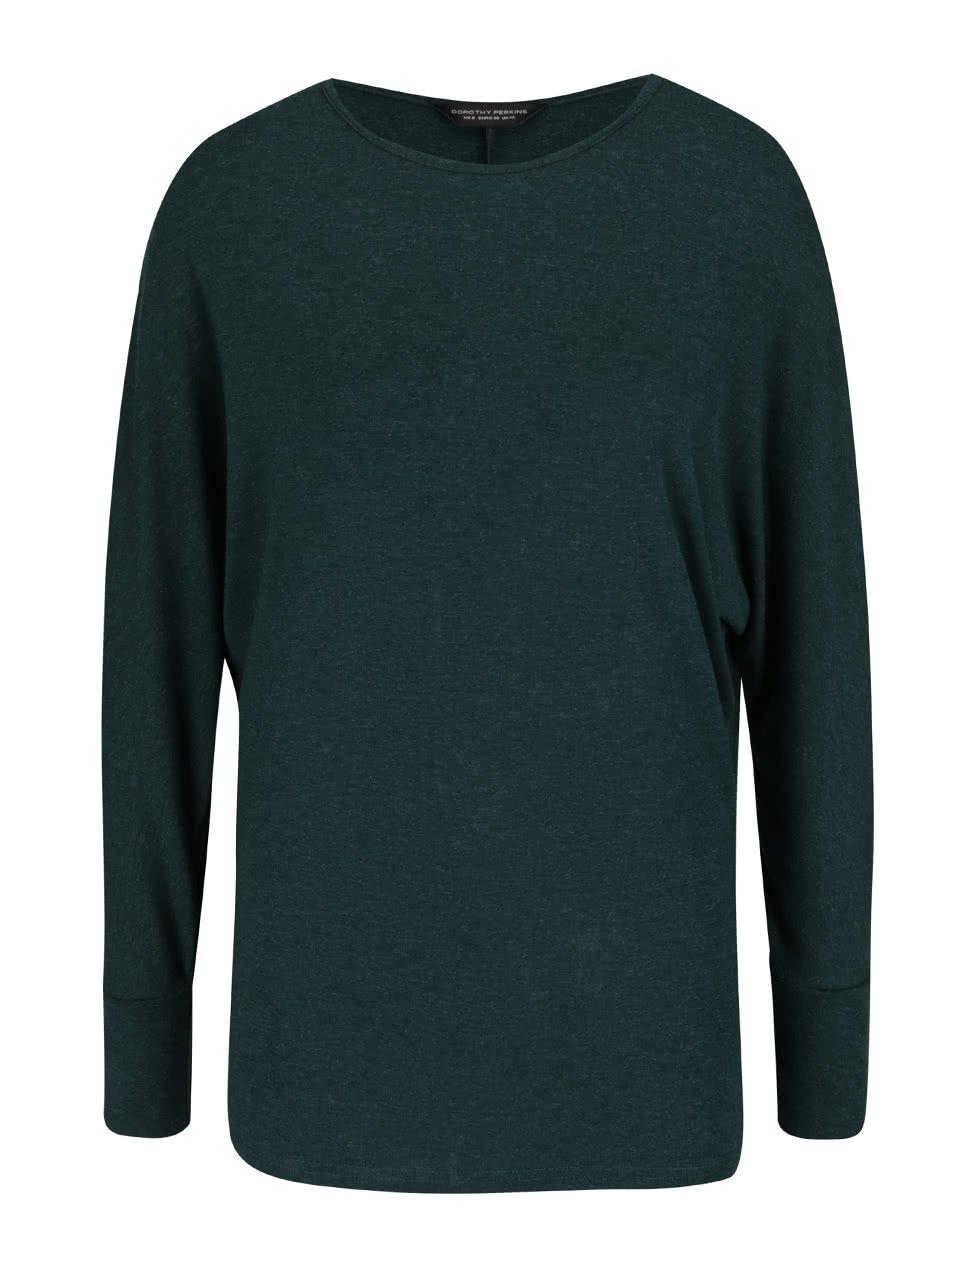 Tmavě zelené tričko s netopýřími rukávy Dorothy Perkins